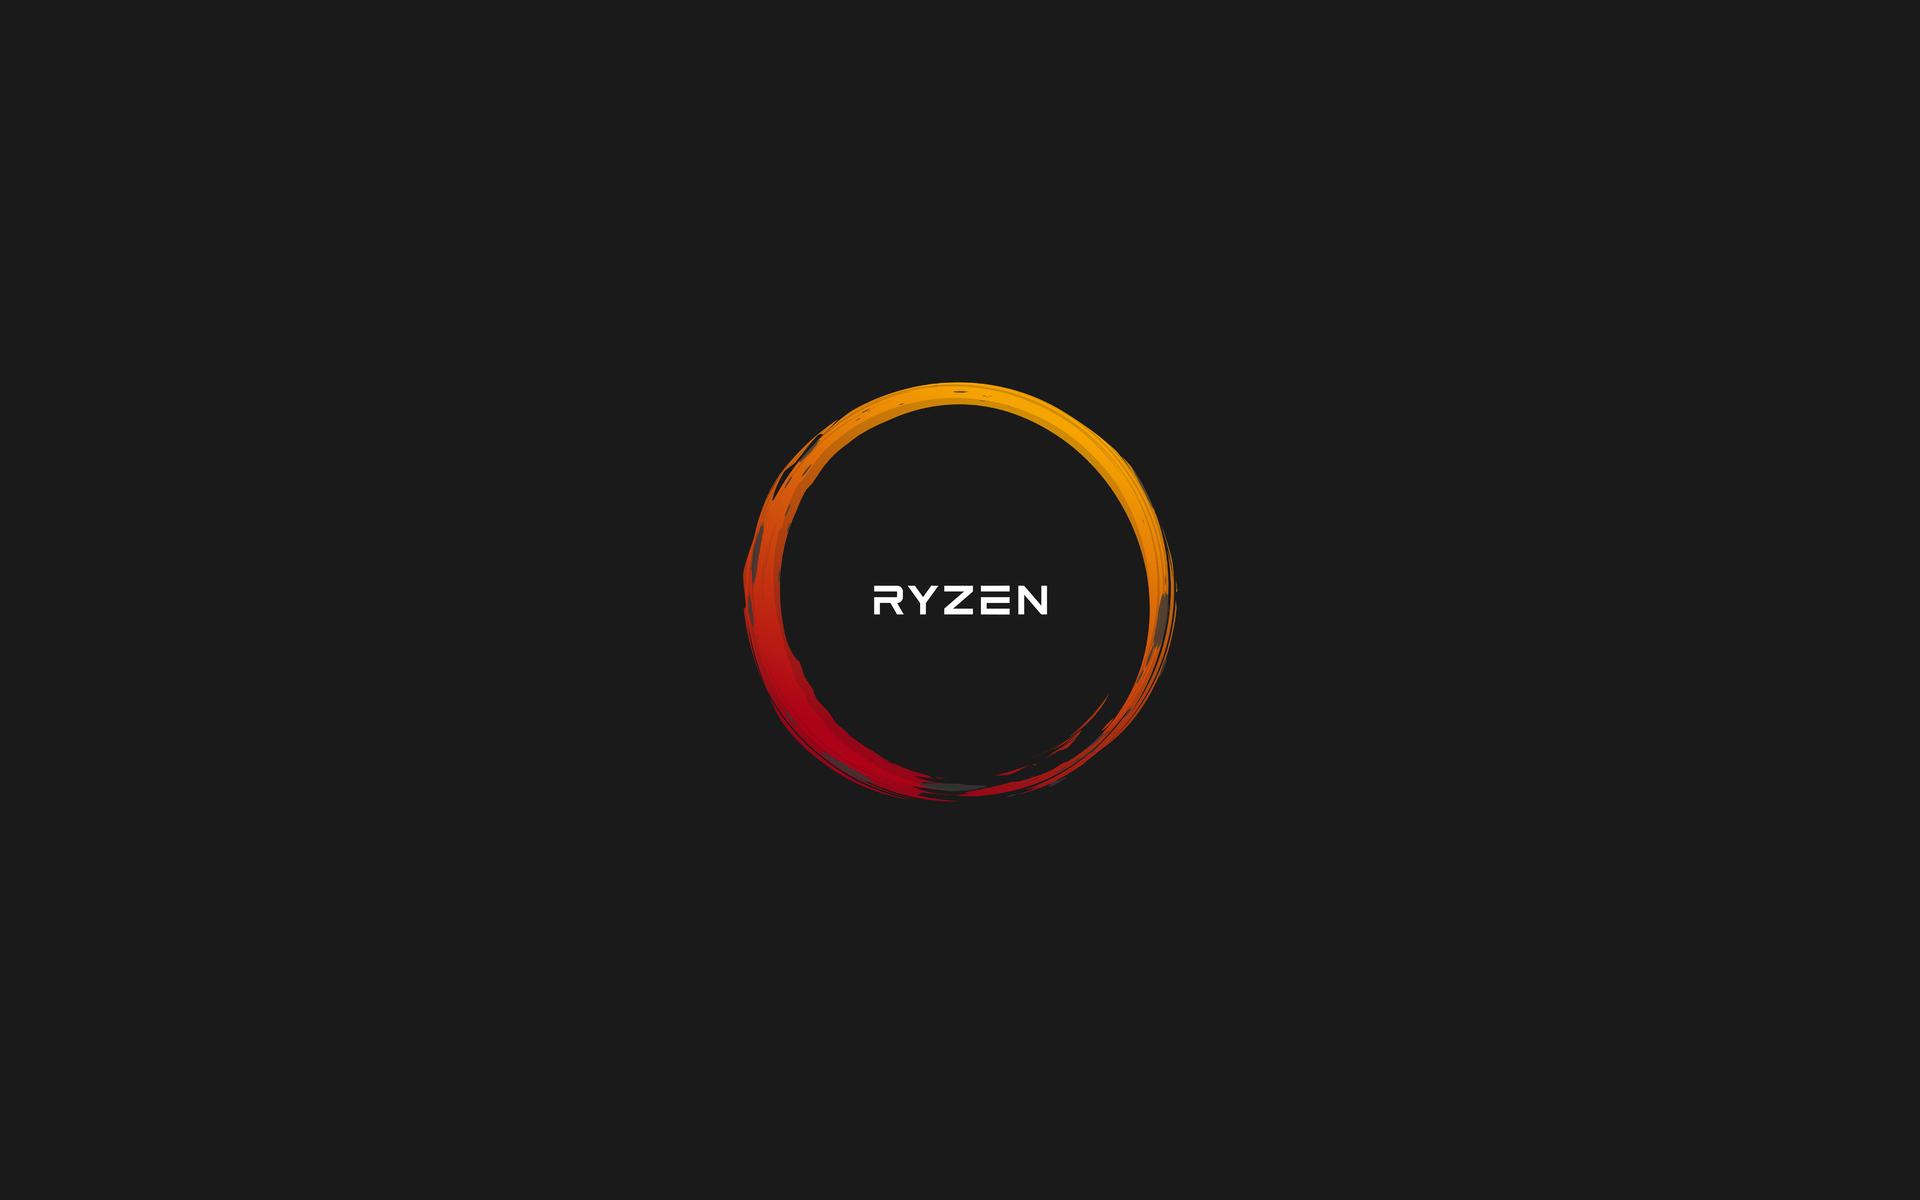 1920x1200 Amd Ryzen 8k 1080p Resolution Hd 4k Wallpapers Images